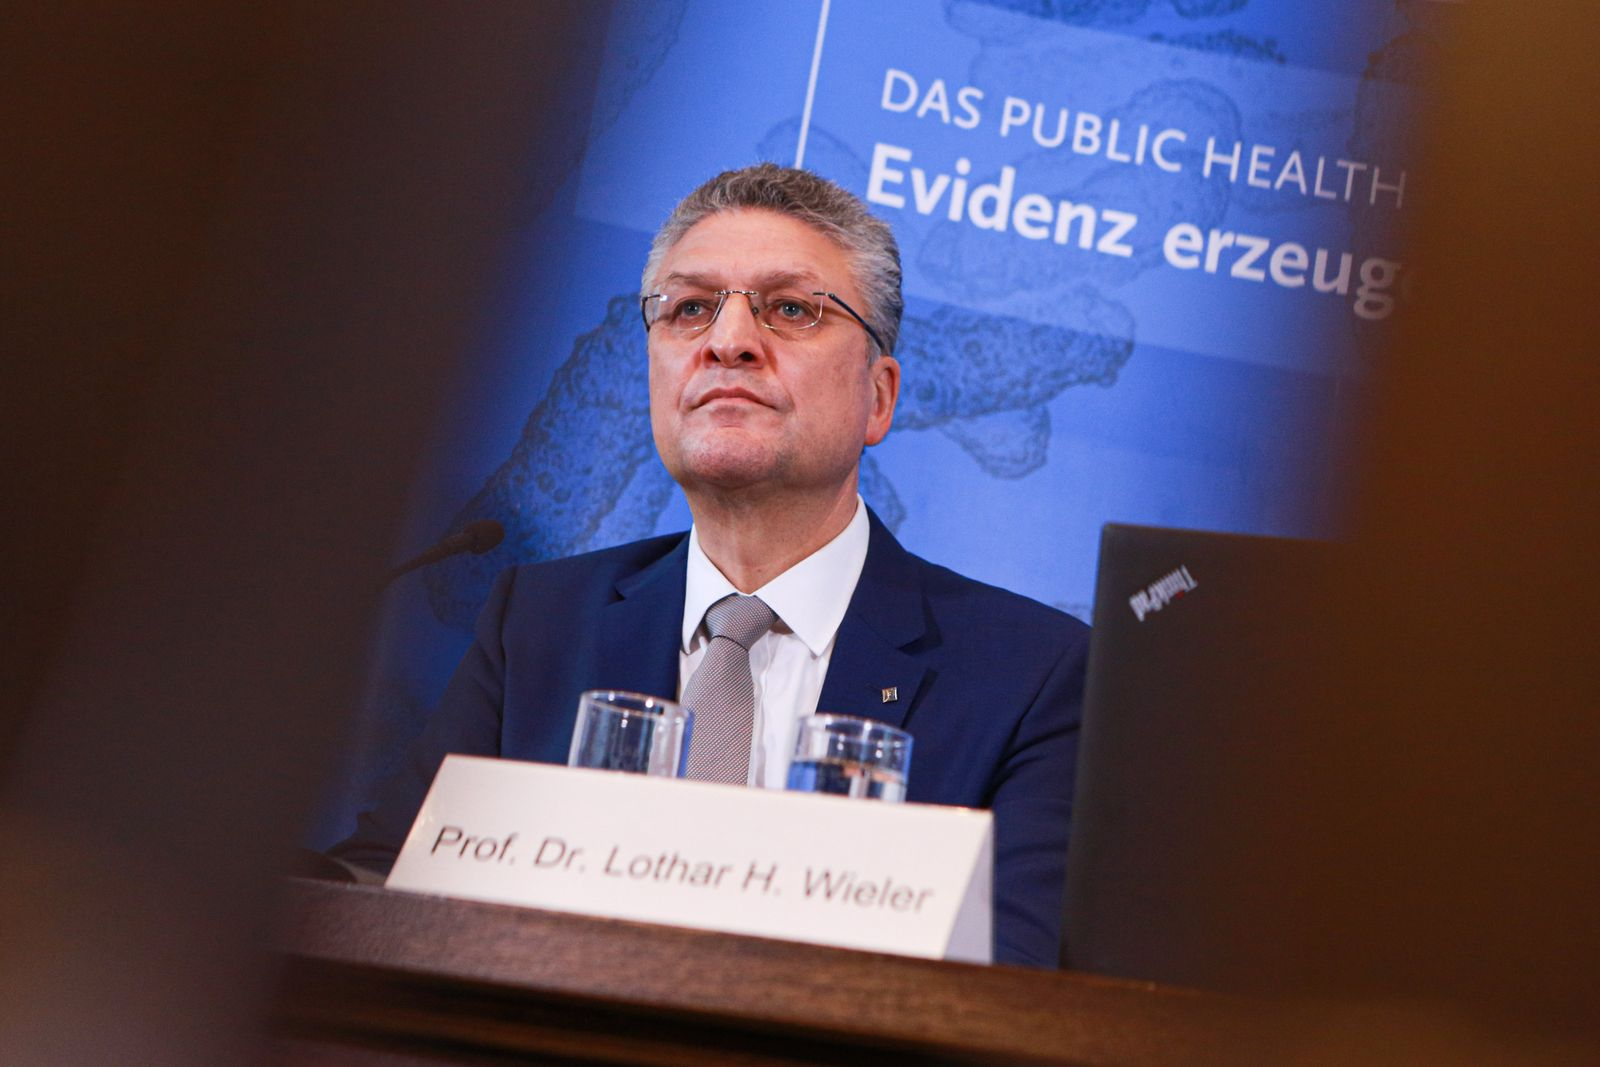 RKI presser on COVID-19 situation, Berlin, Germany - 19 Nov 2020